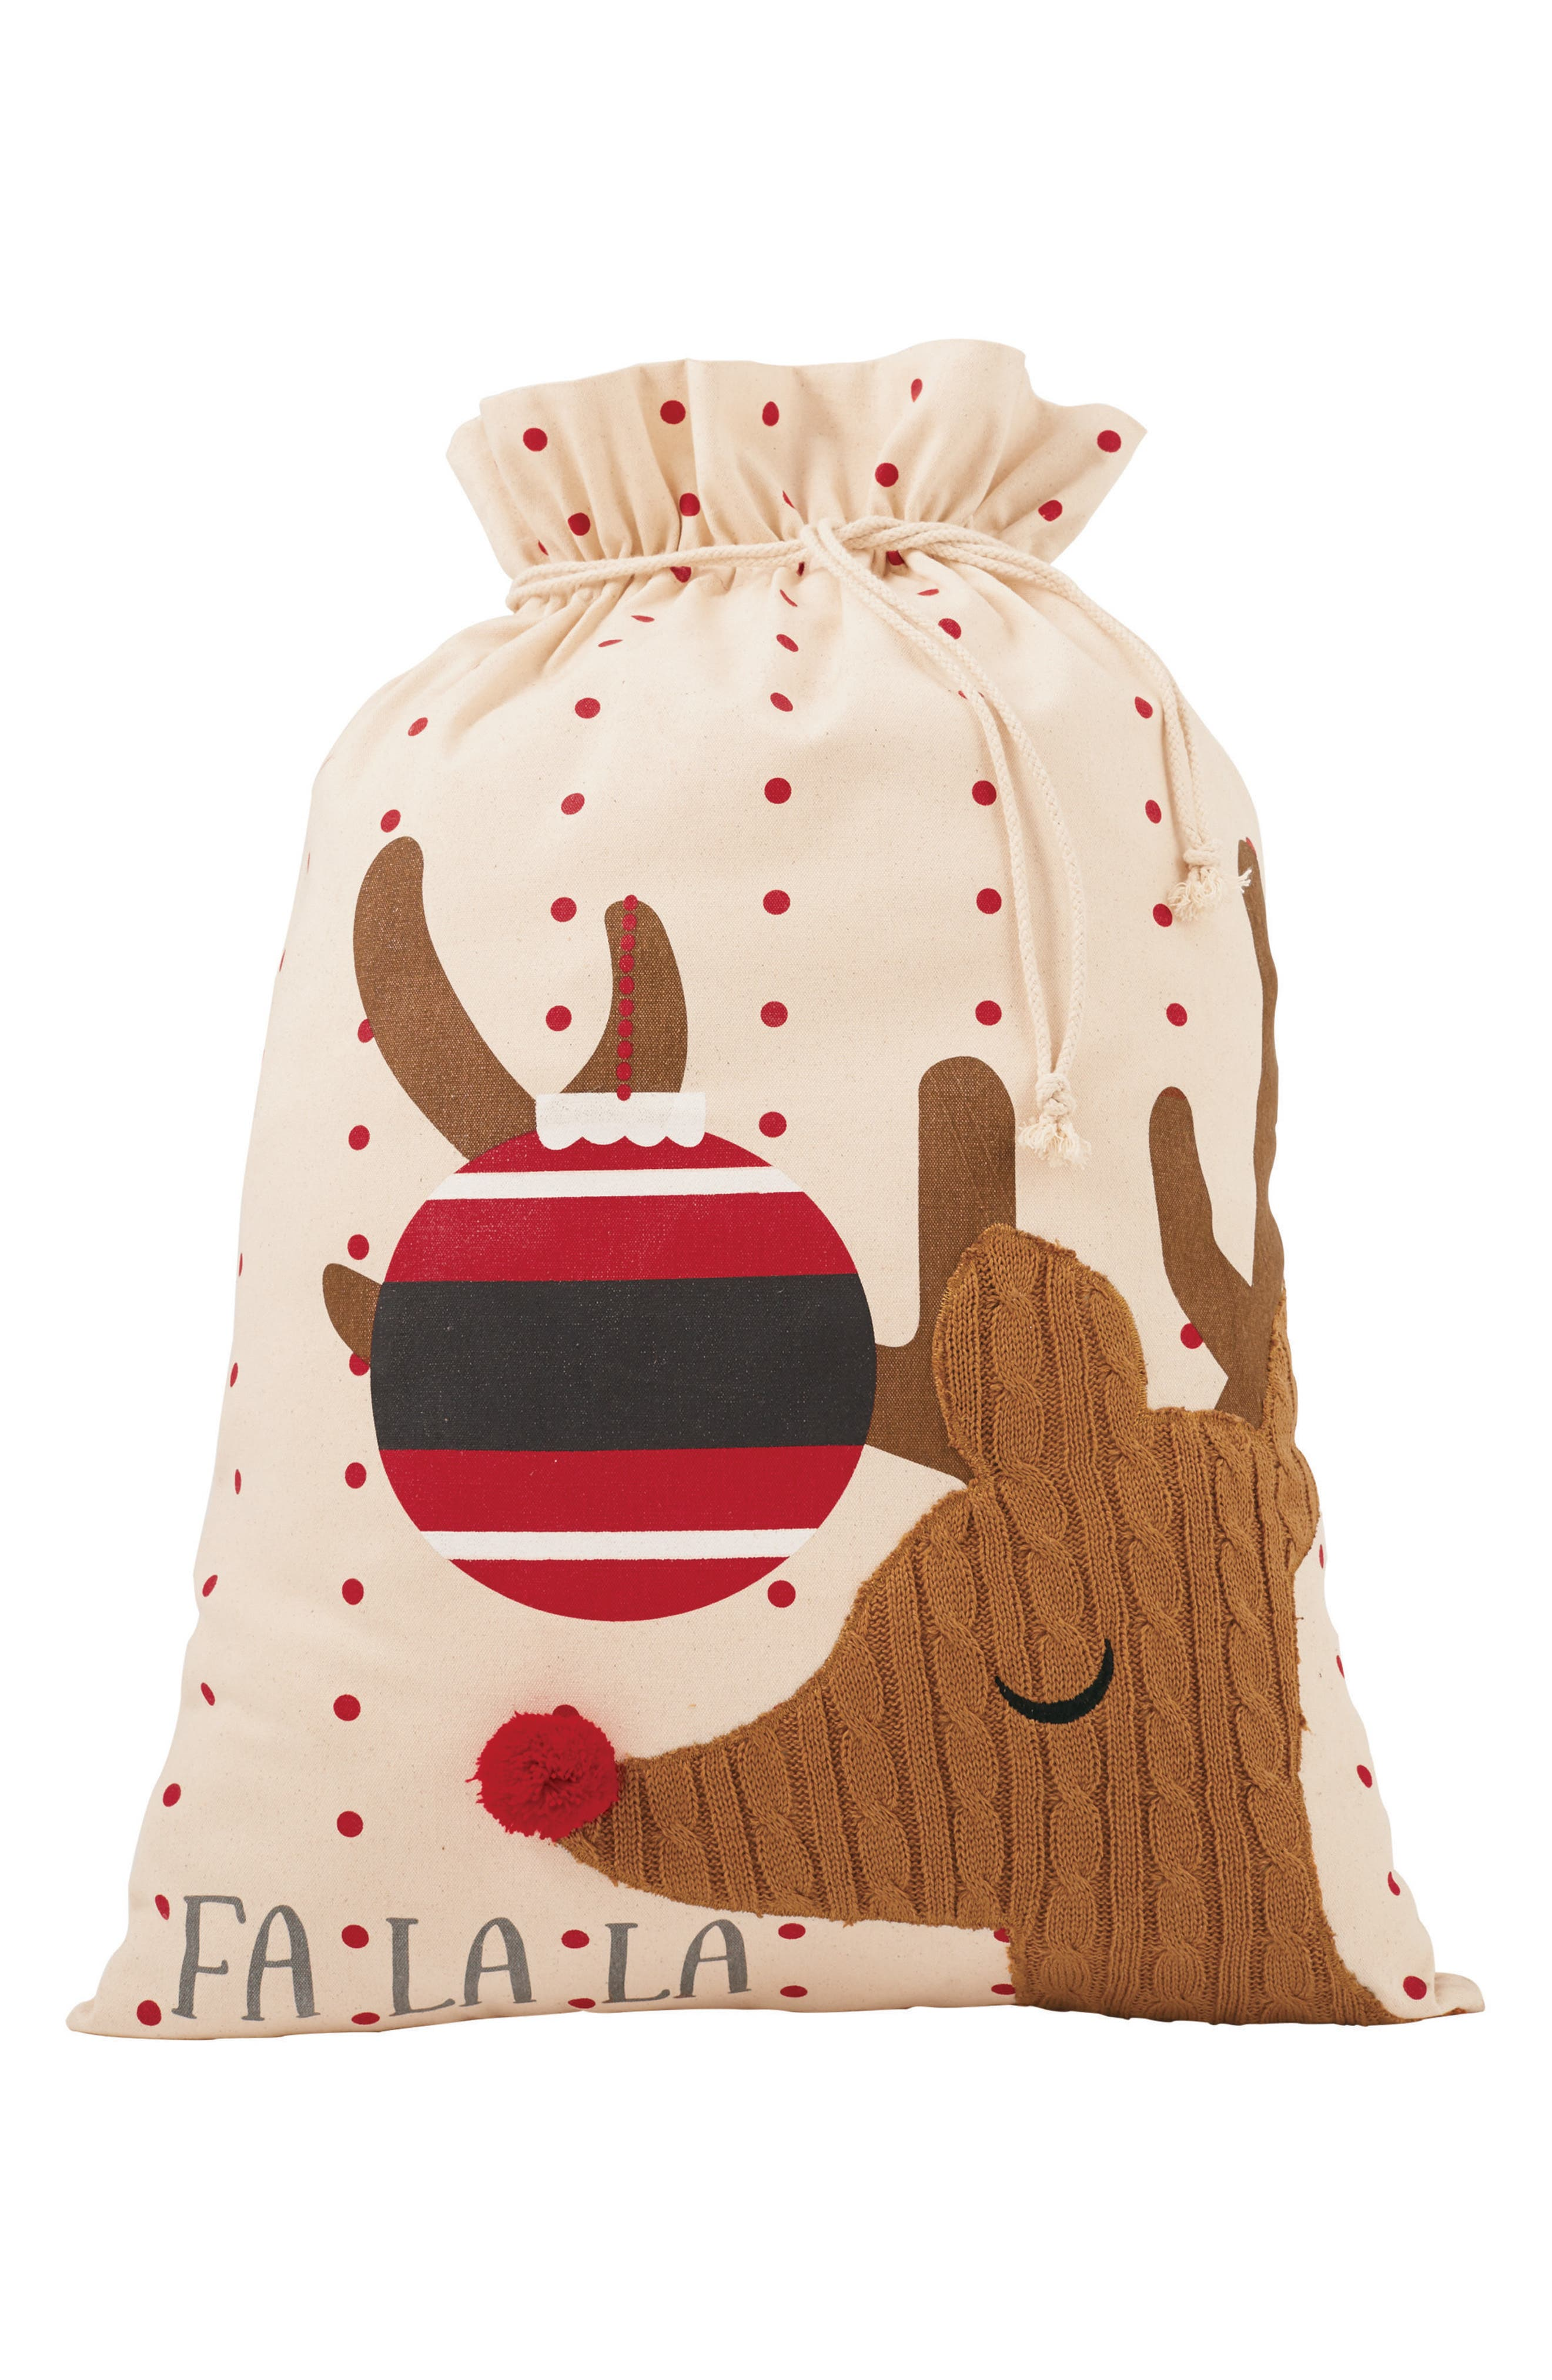 Main Image - Mud Pie Fa La La Reindeer Canvas Gift Sack